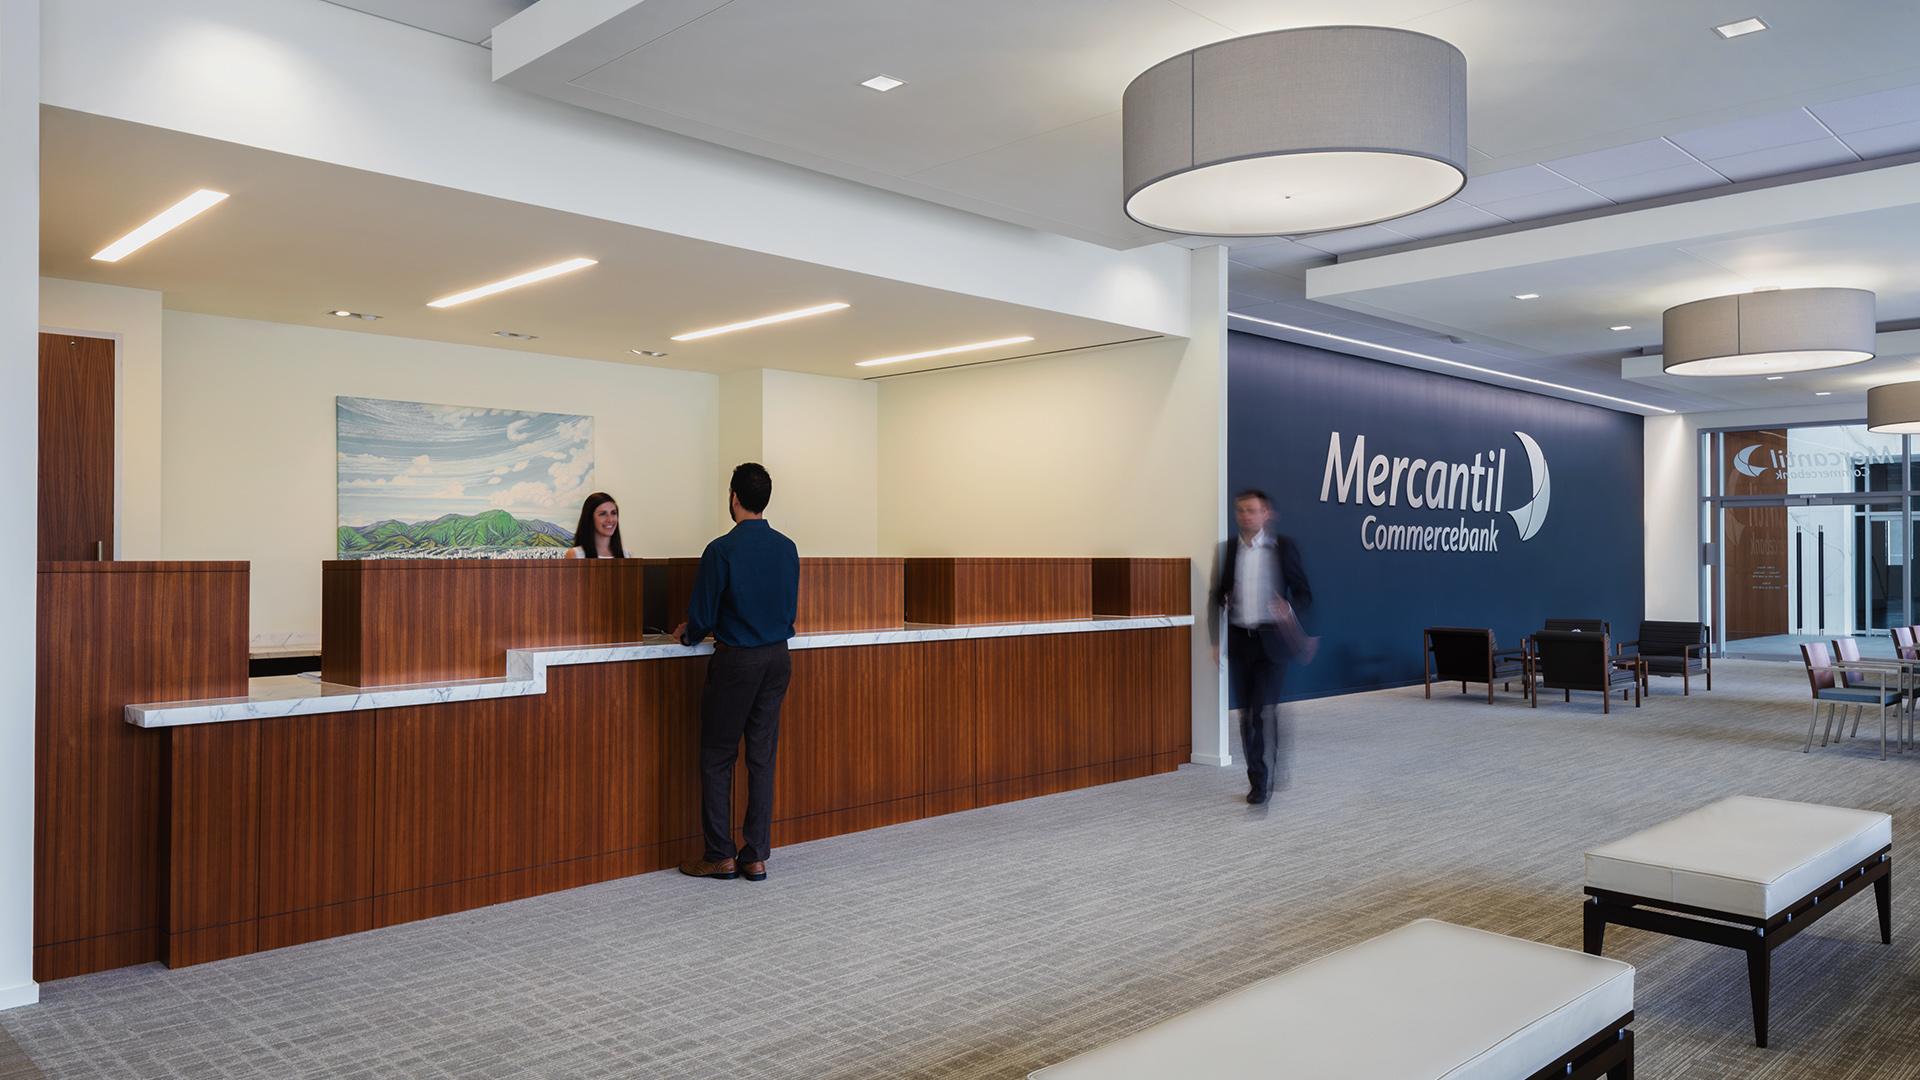 Financial Retail Interior Design Mercantil Commercebank Champions Louetta Transaction Counter